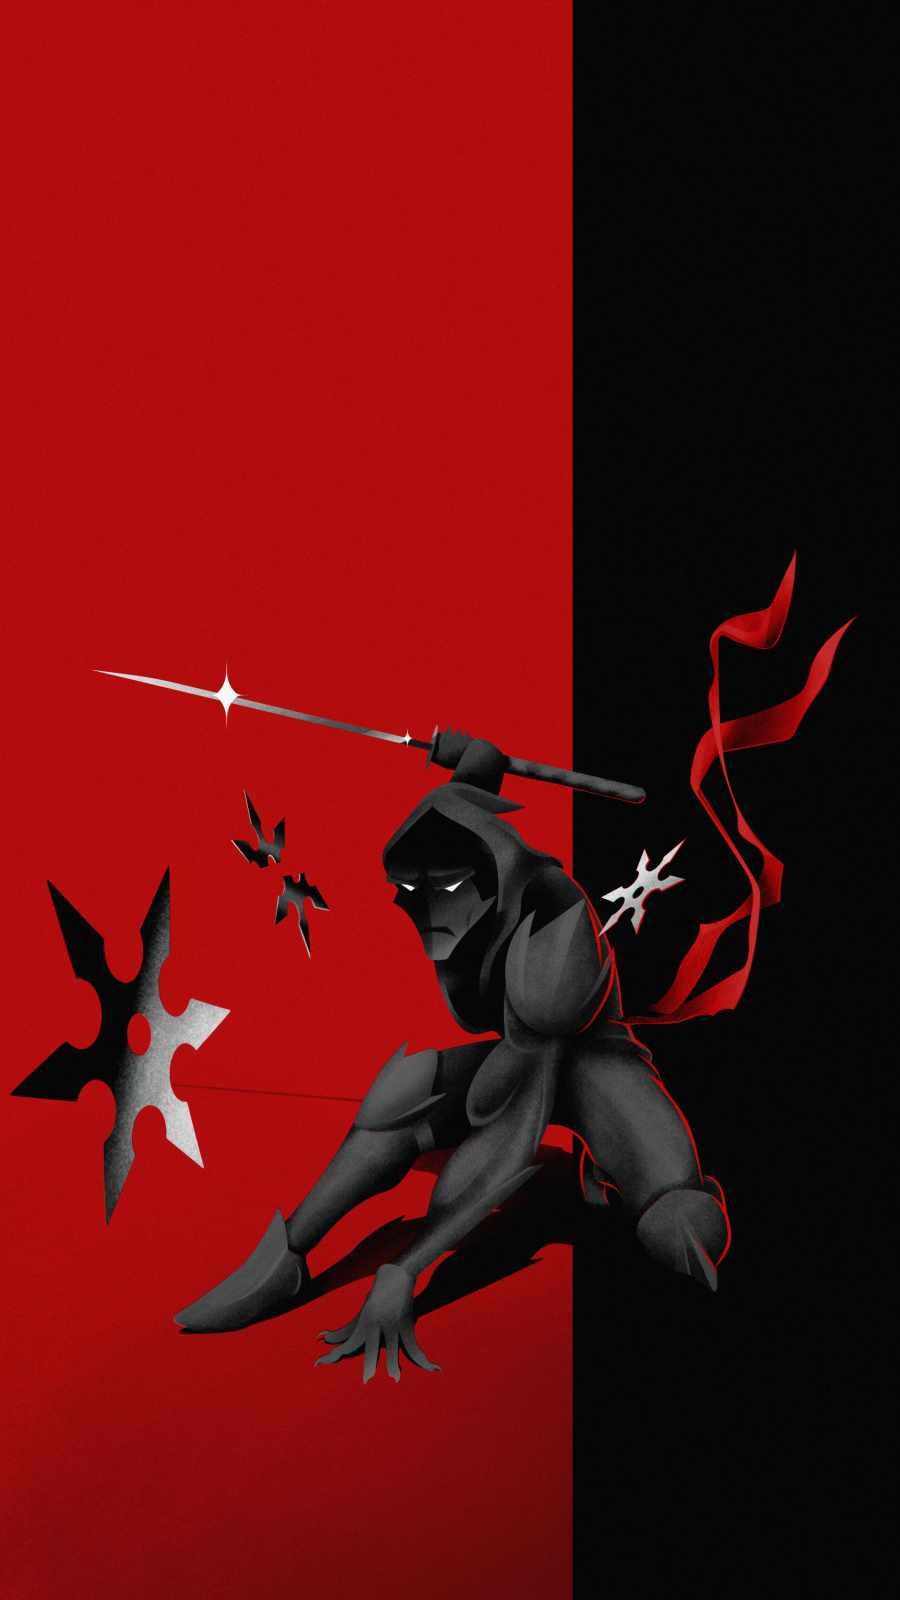 Ninja Attack iPhone Wallpaper